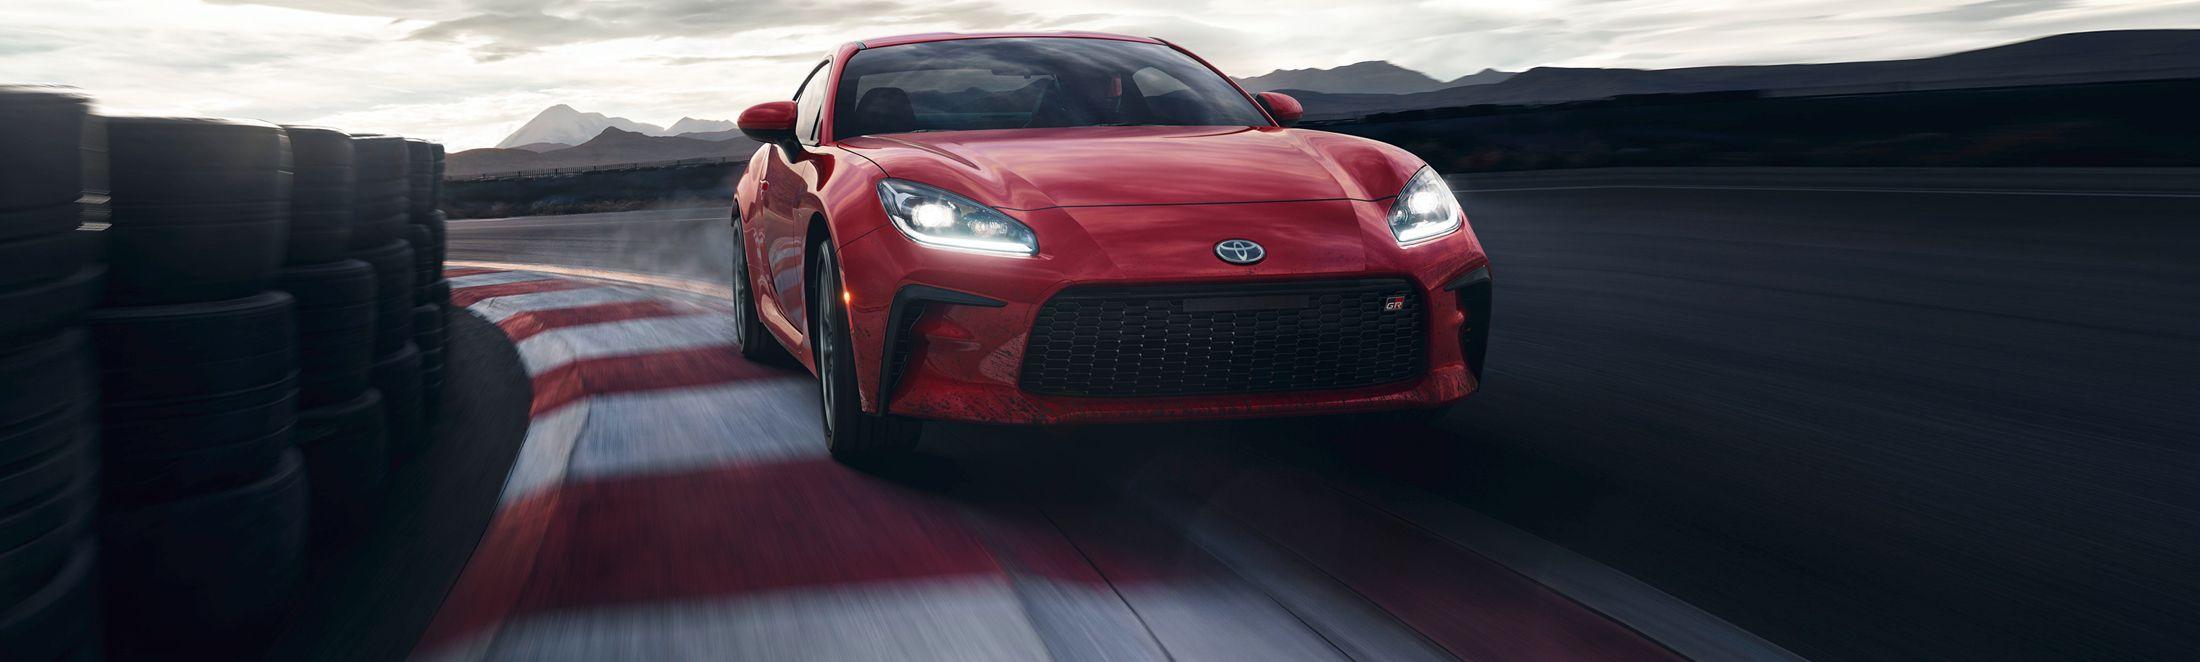 Future Cars & Concepts Vehicles